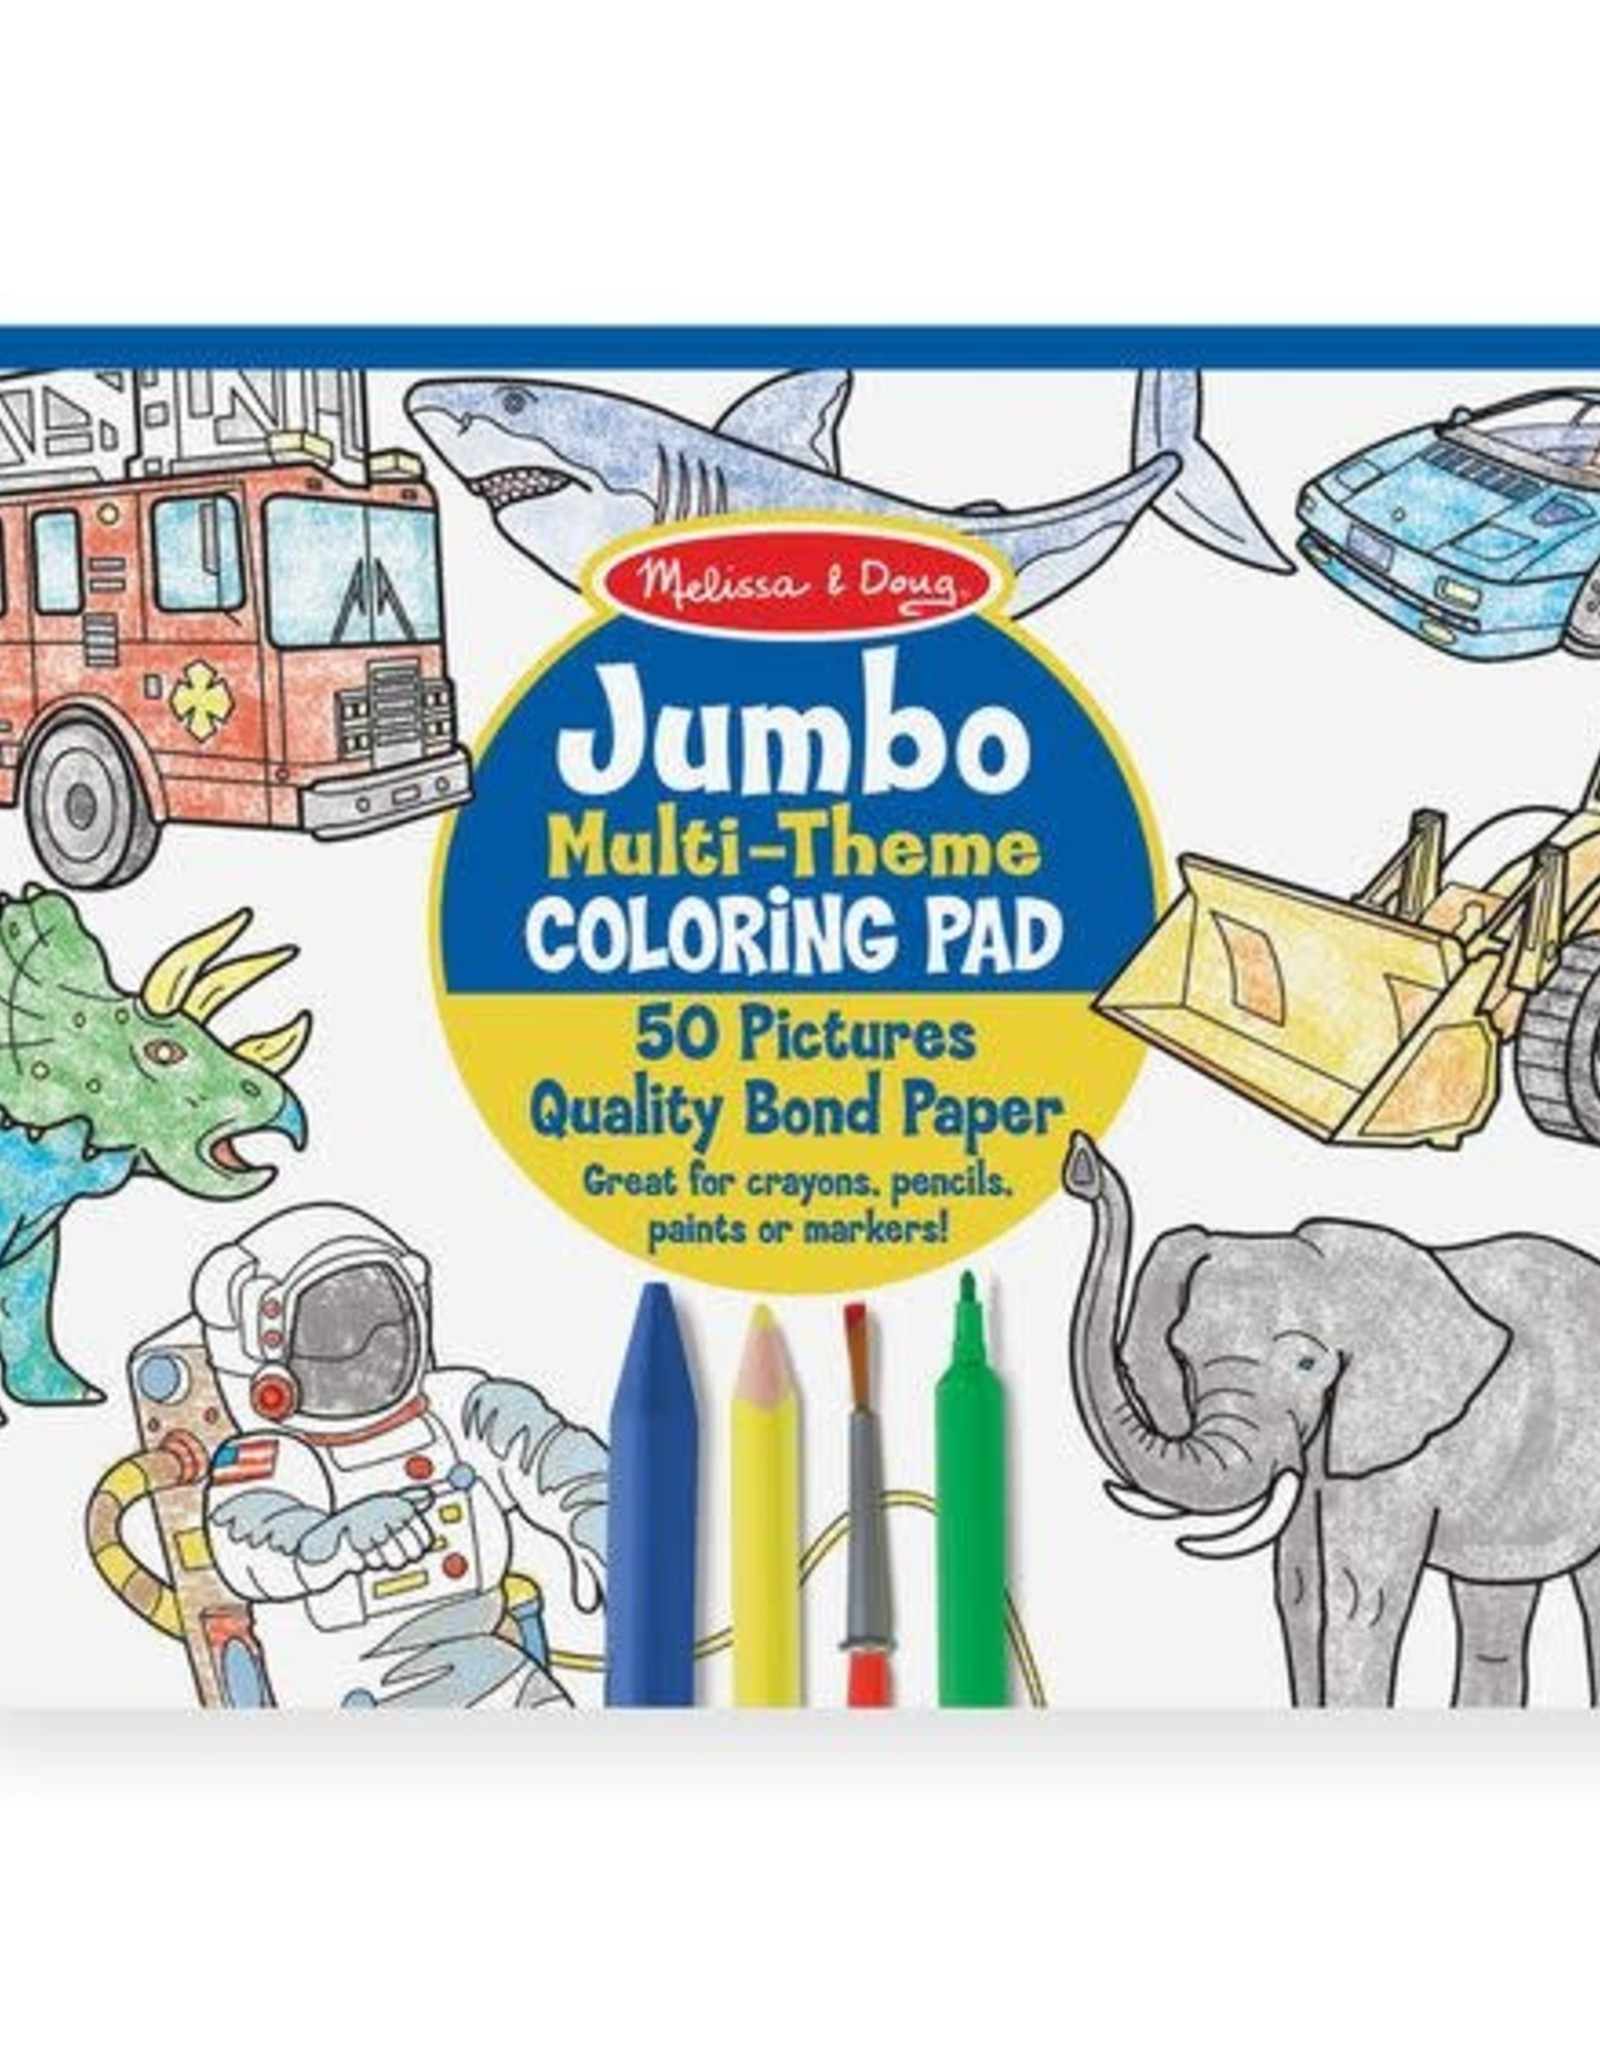 Melissa & Doug Melissa & Doug Jumbo Colouring Pad - Space, Sharks, Sports